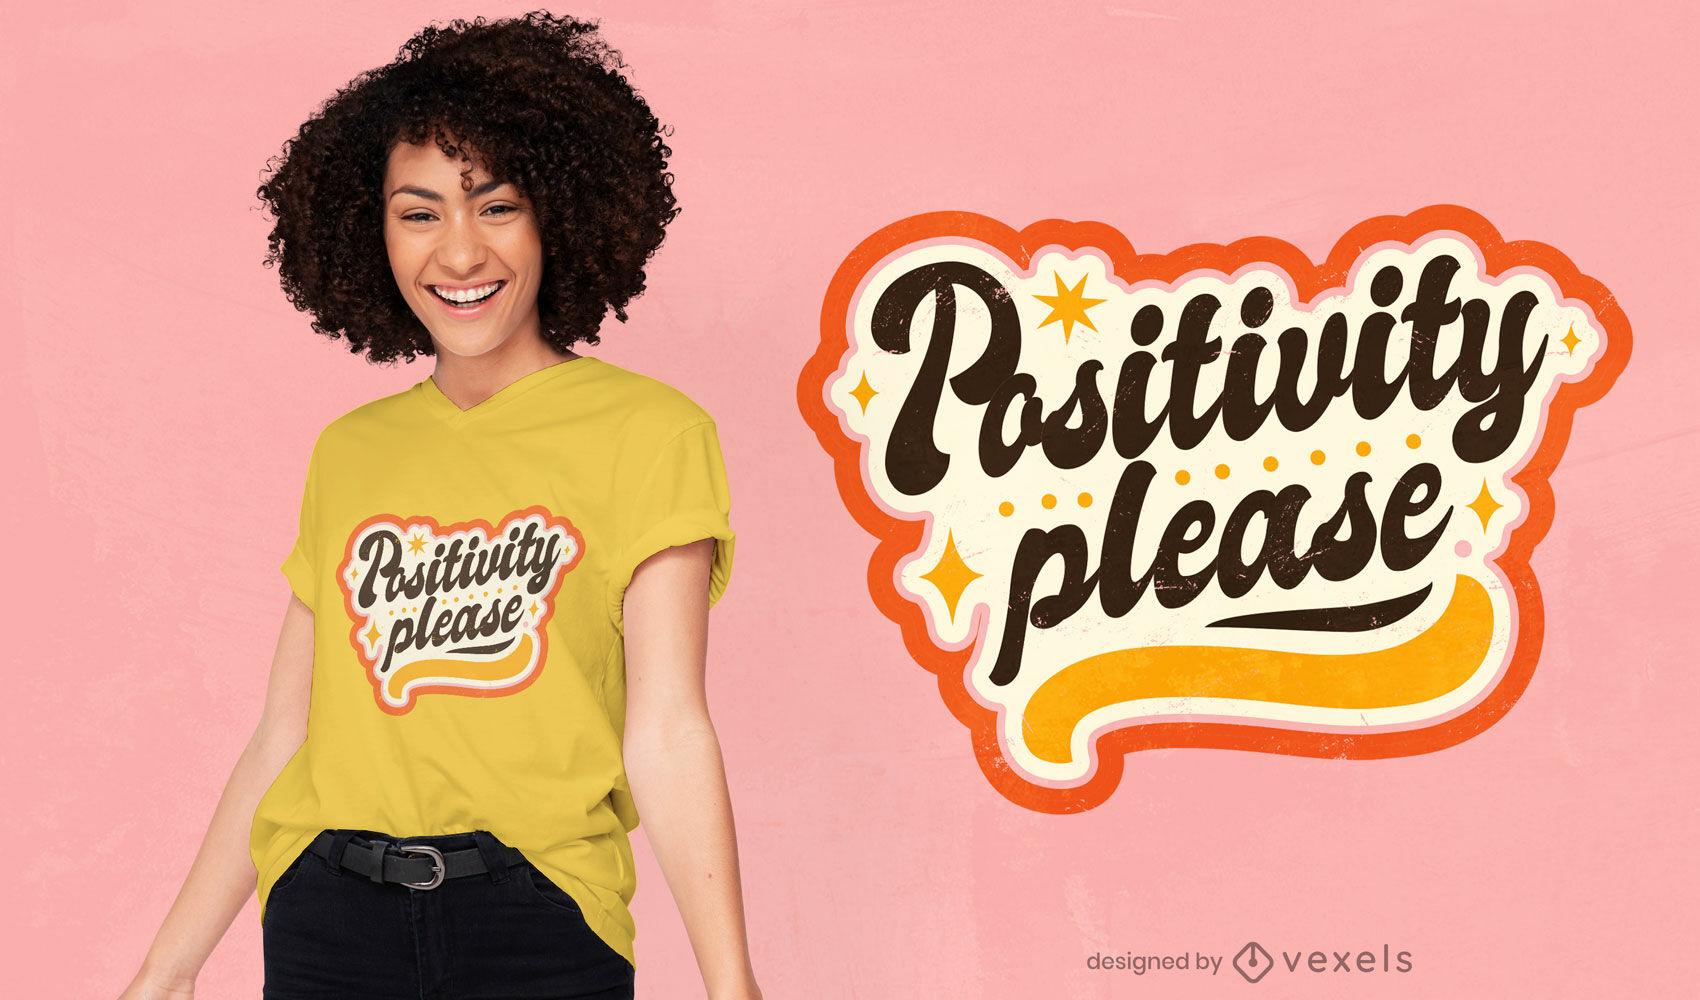 Positividade, por favor, lettering design de t-shirt